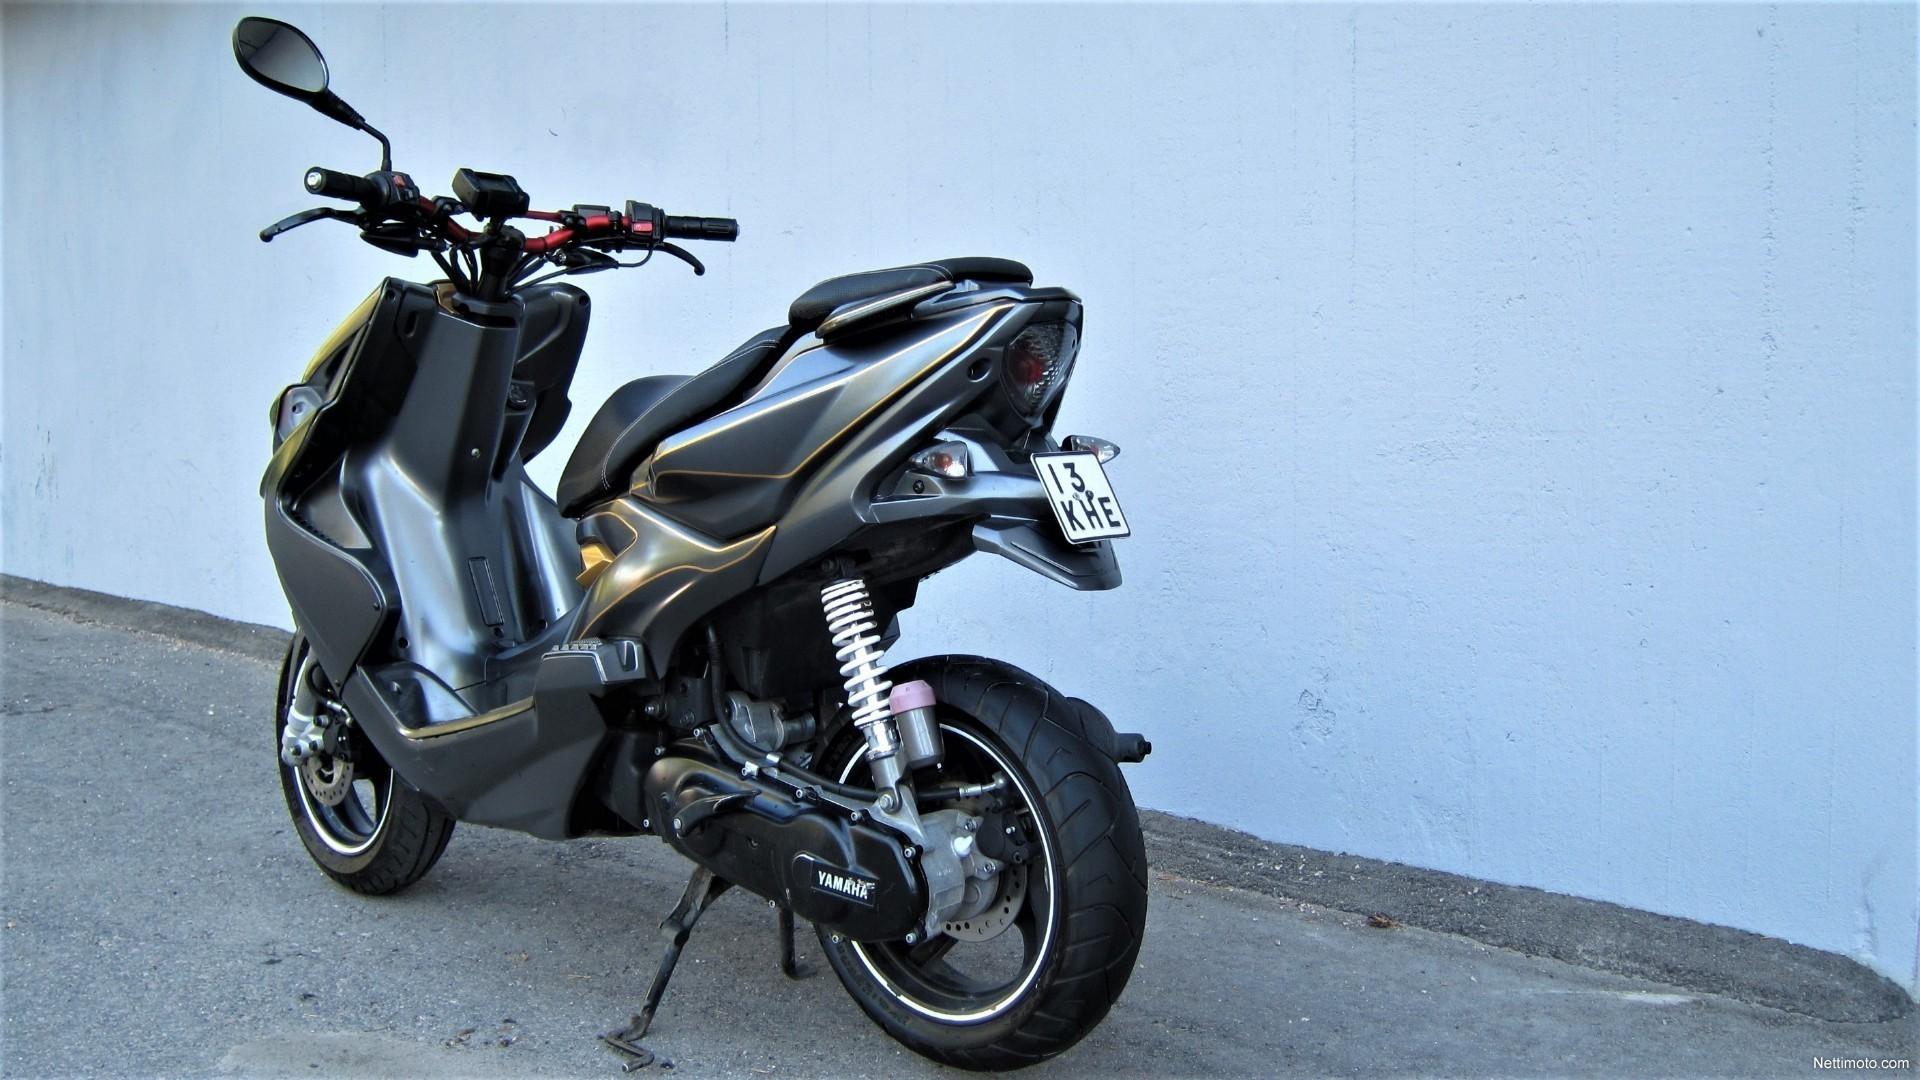 rijindruk Yamaha Aerox R naked - Scooter&bikexpress